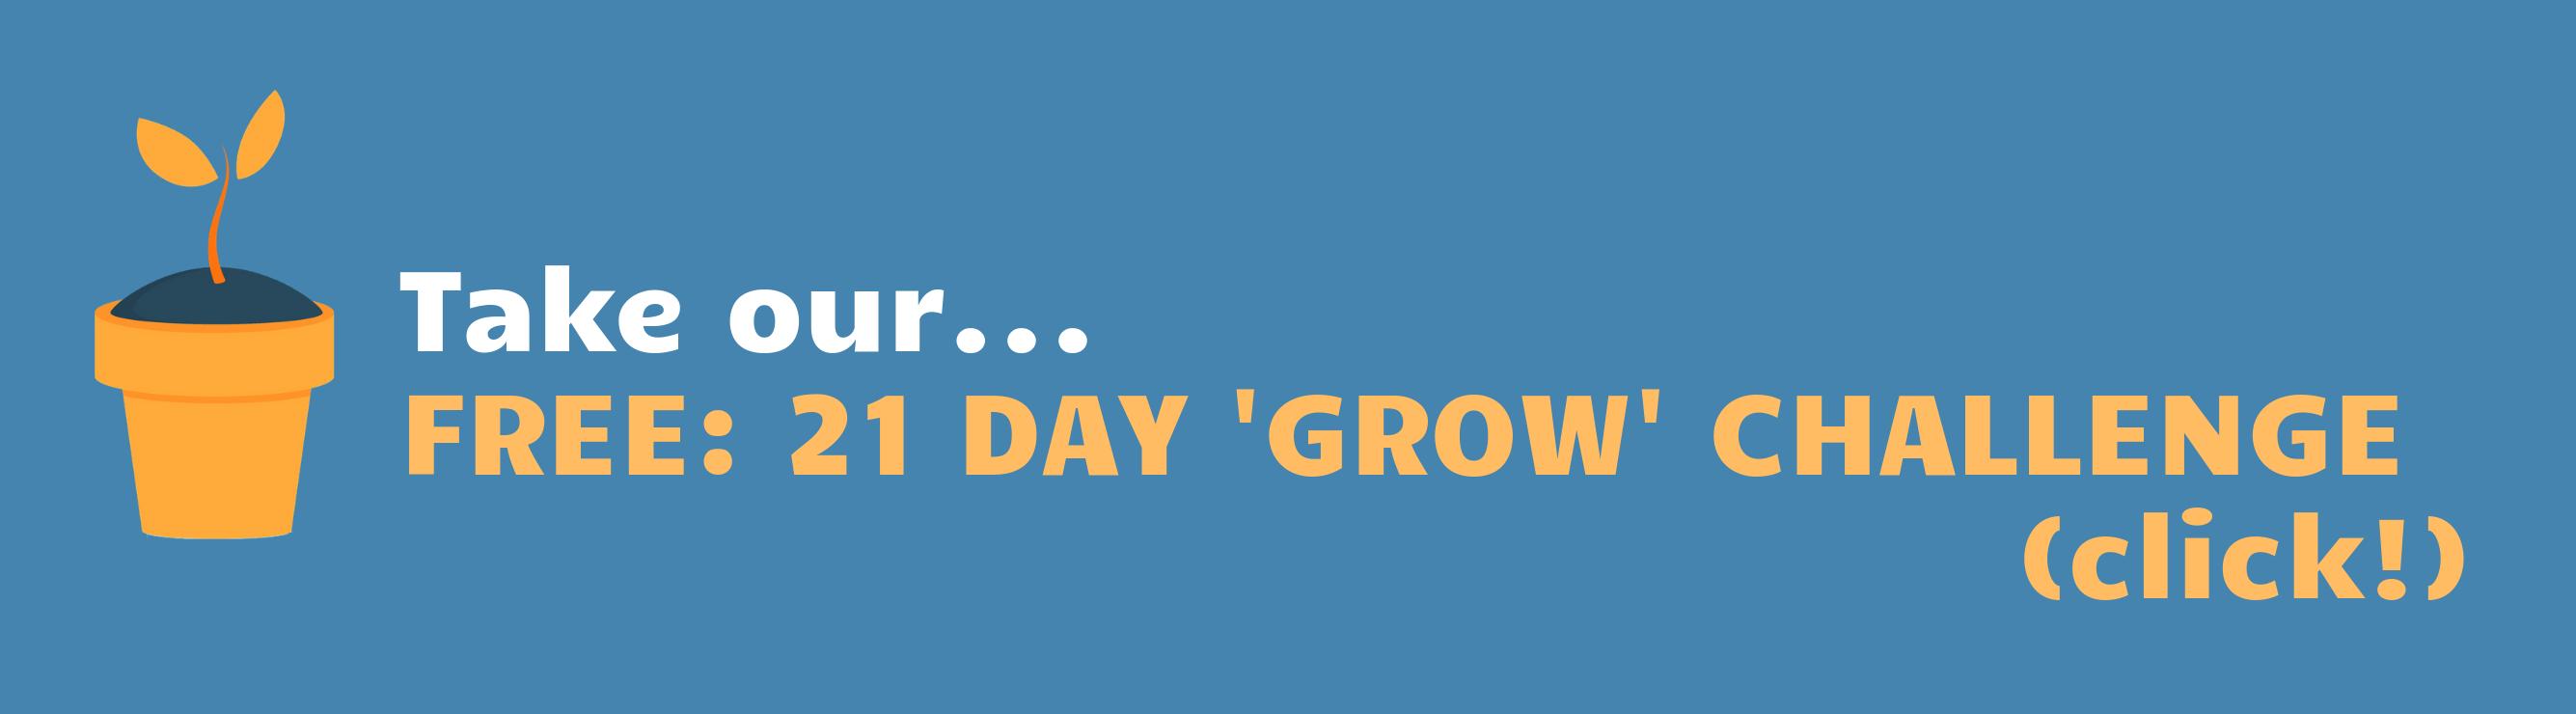 free 21 day grow challenge